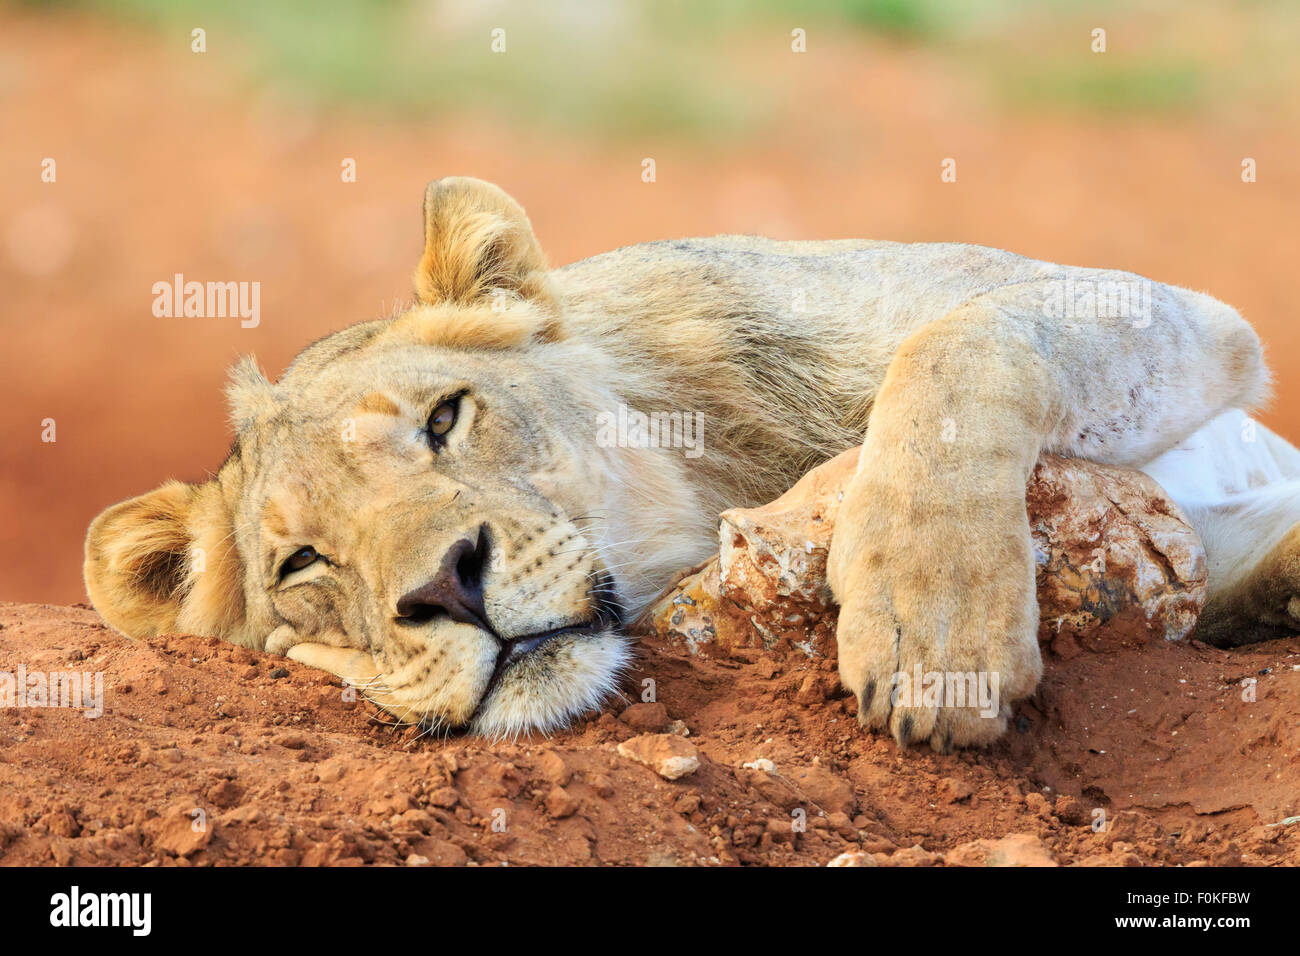 La Namibie, Etosha National Park, jeune lion paresseux Photo Stock